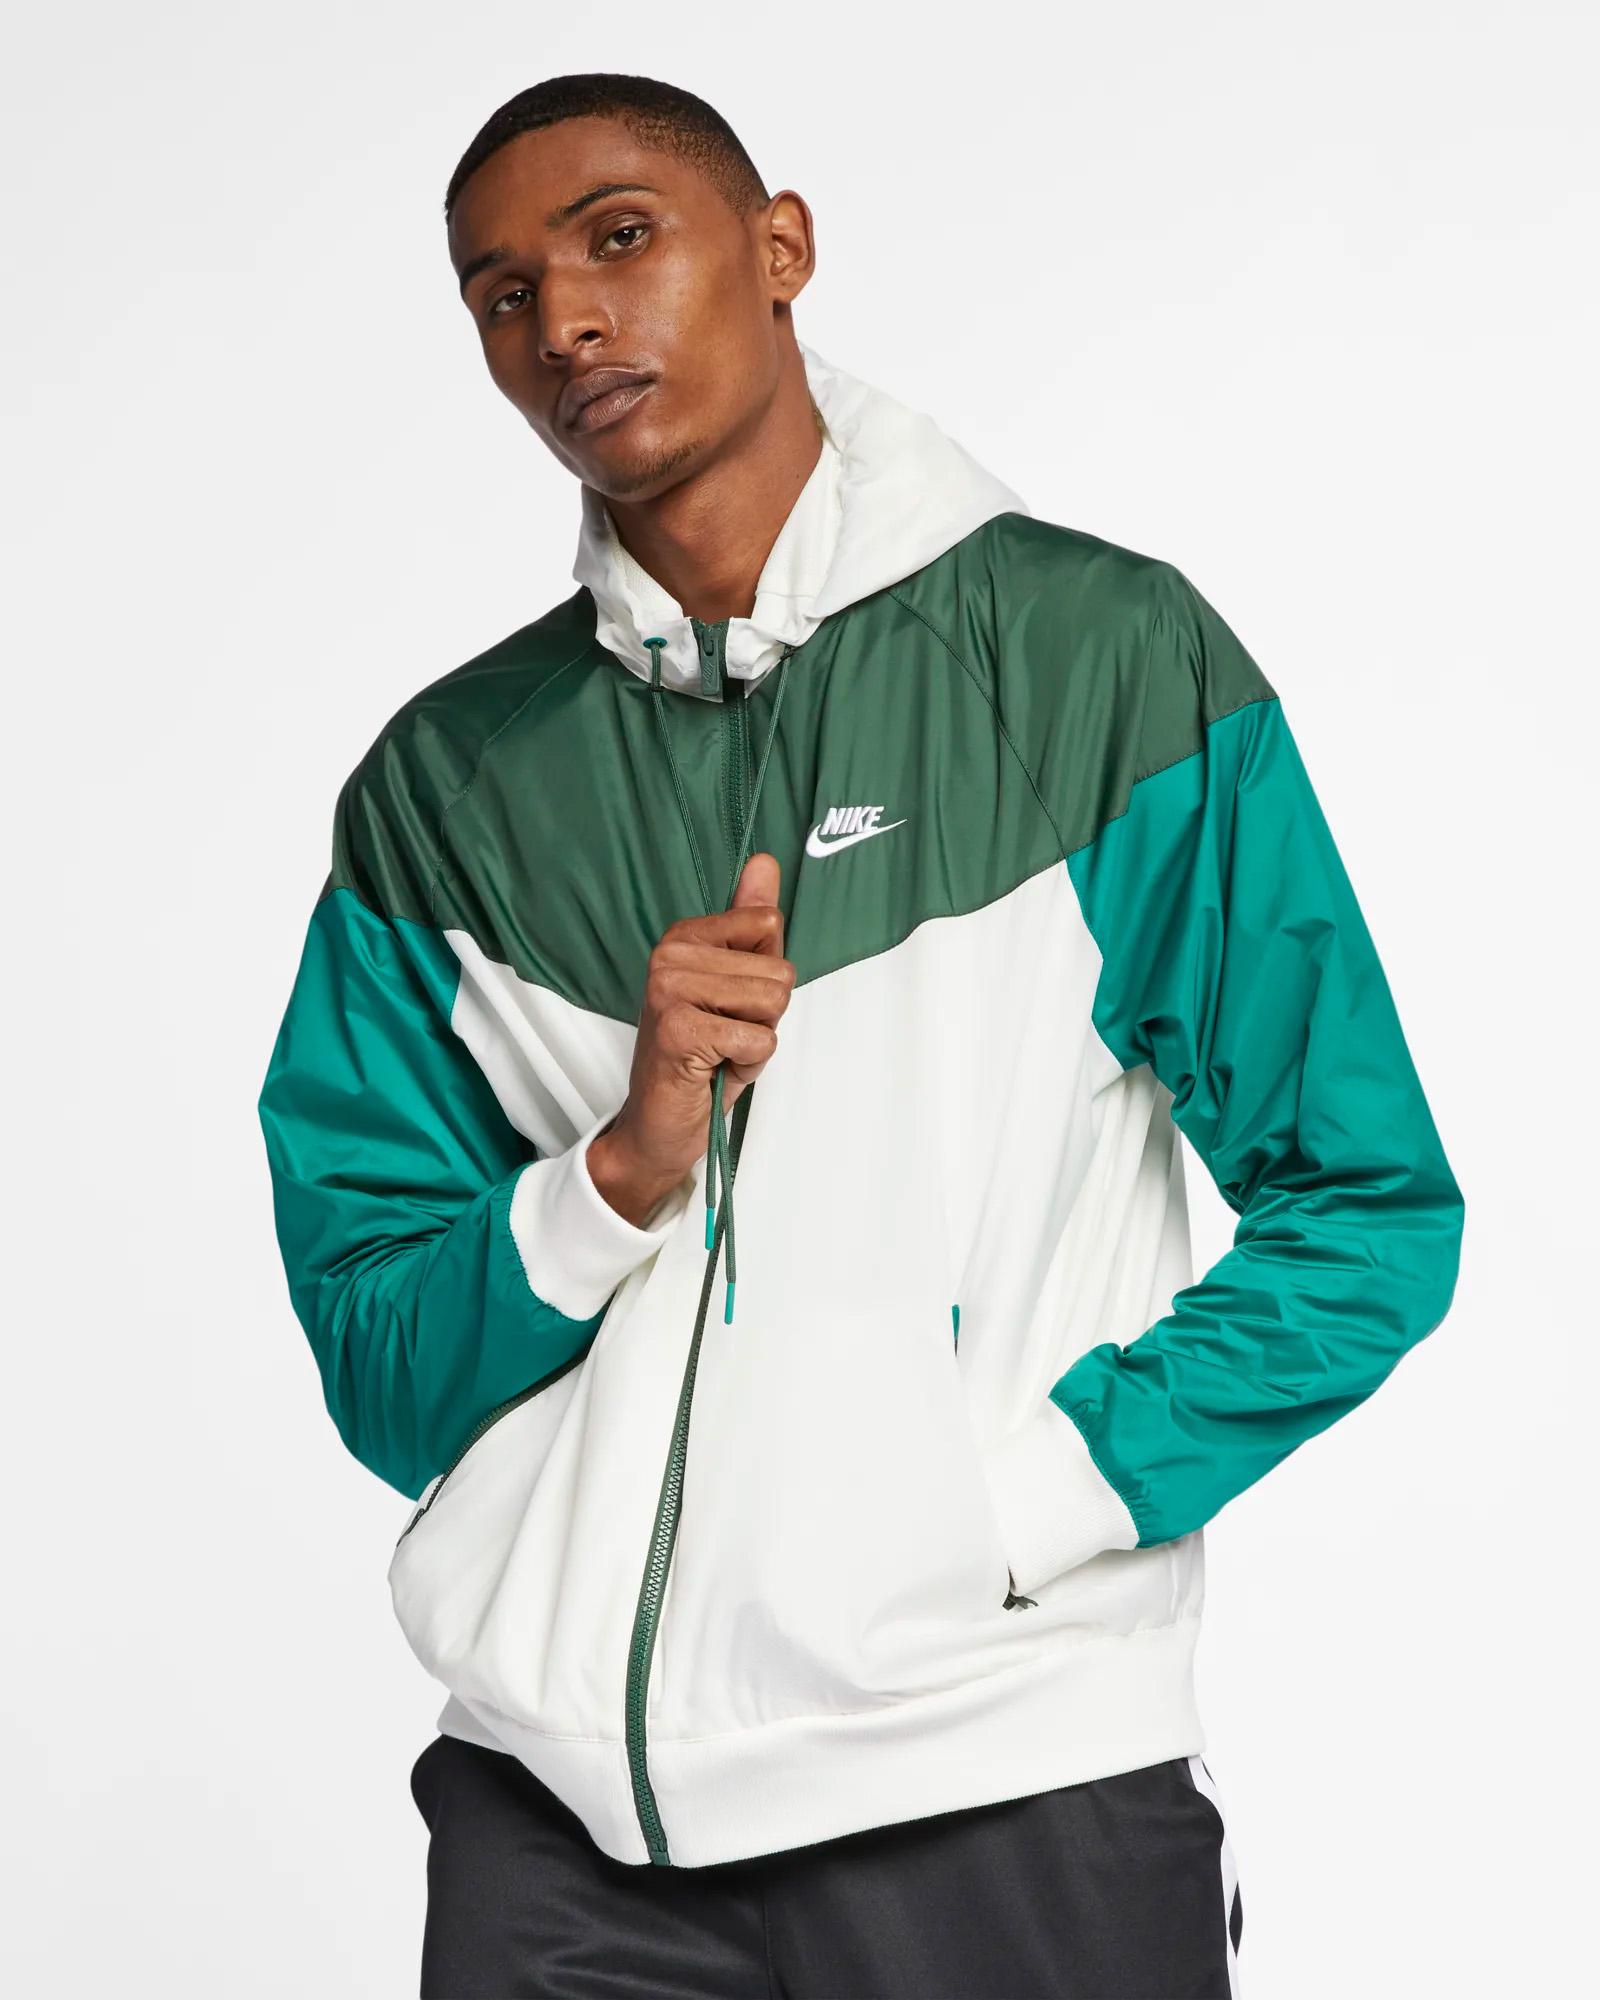 65fa7d1ec Nike Sportswear Windrunner Jacket - SPORTING GOODS Sports Jackets |  Windrunners - Superfanas.lt